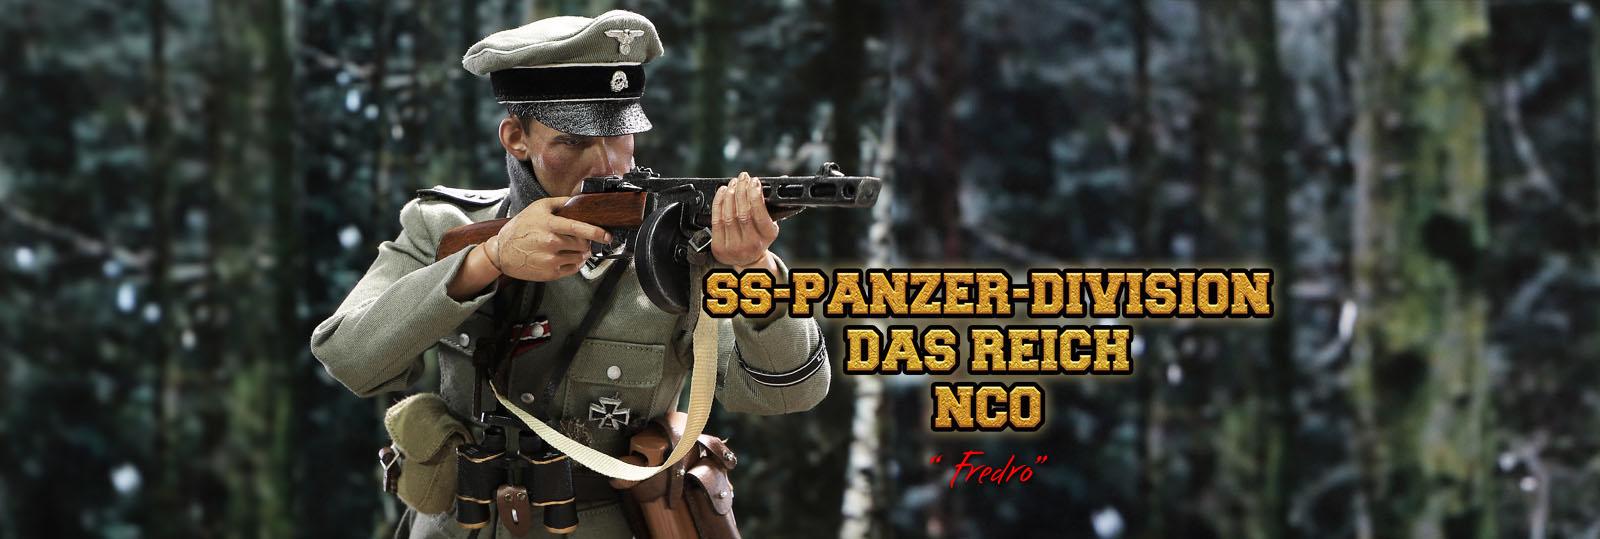 FREDO-c.jpg